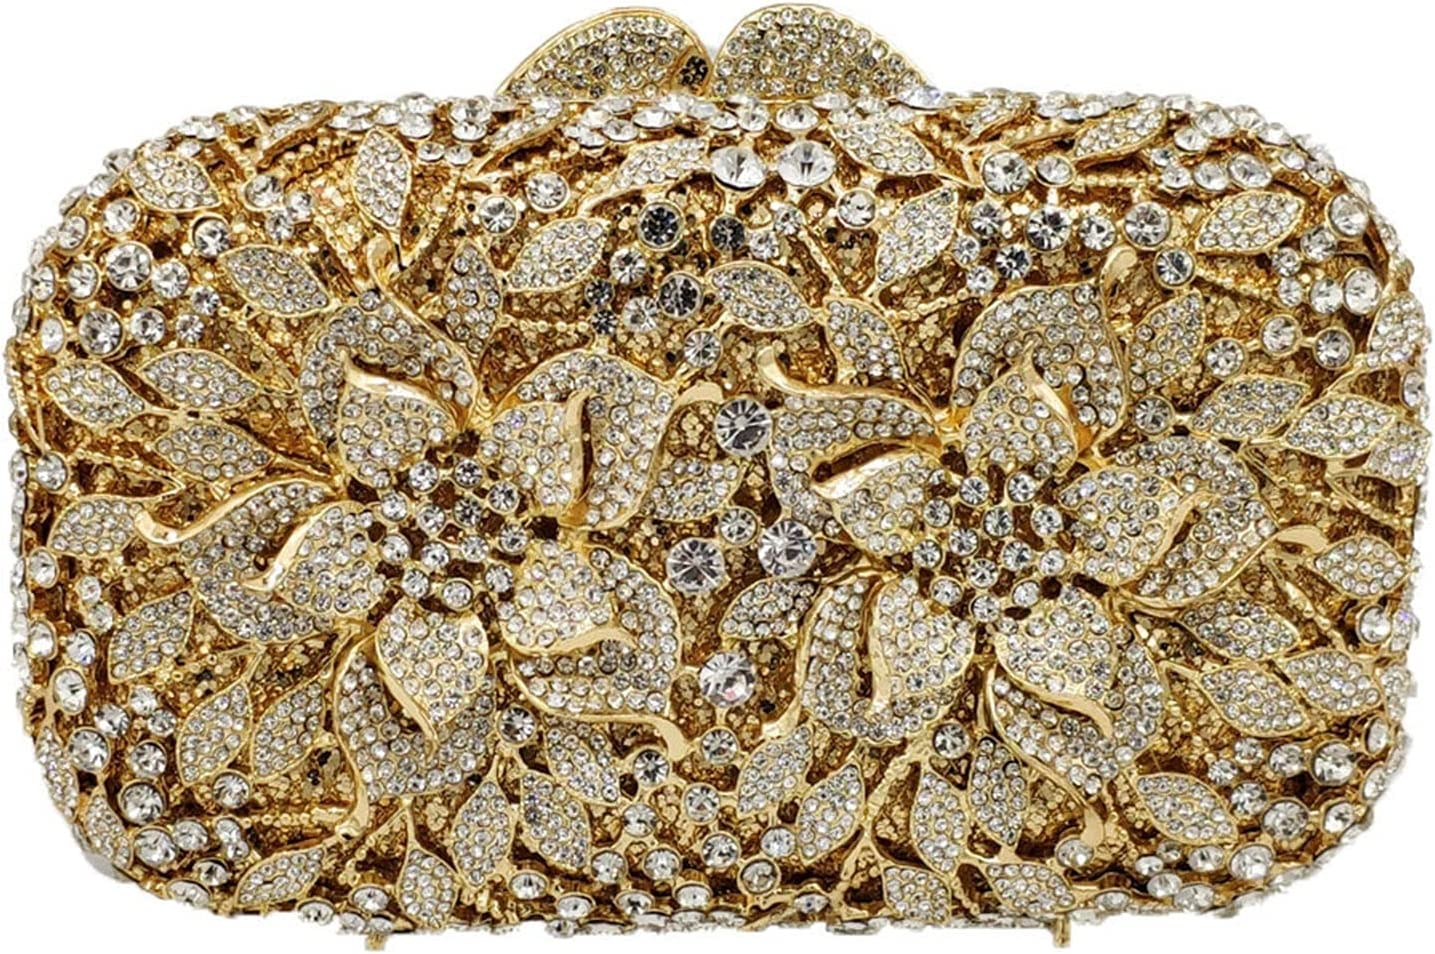 Women's Evening Bag Flower Clutch Bag Women Crystal Evening Bags Wedding Party Shoulder Handbag Hollow Out Dress Purse (Color : Gold, Size : Small)